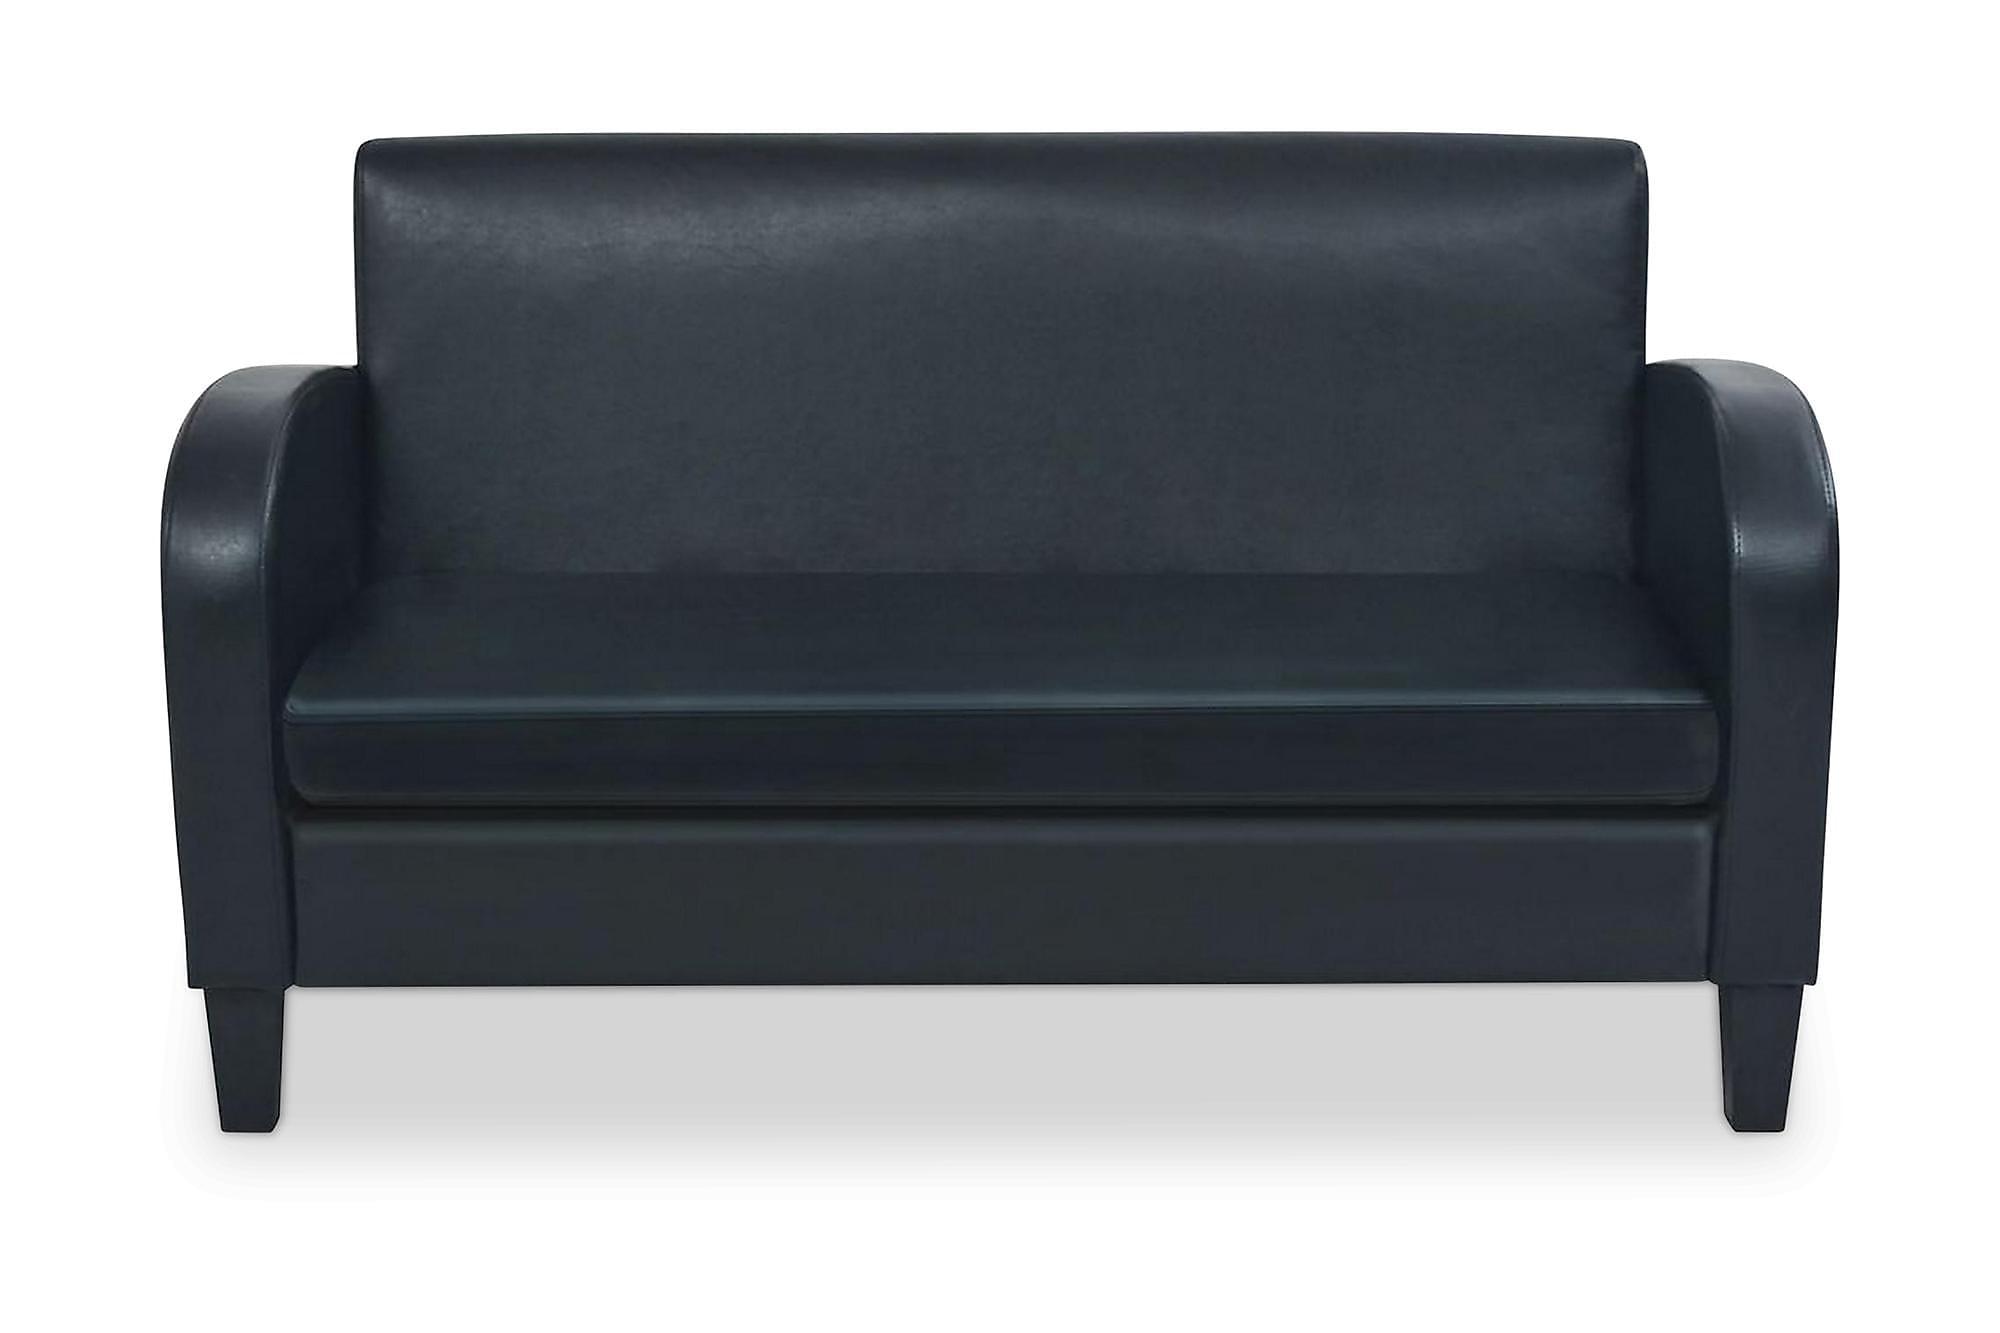 2-sitssoffa i konstläder svart, 2-sits soffor